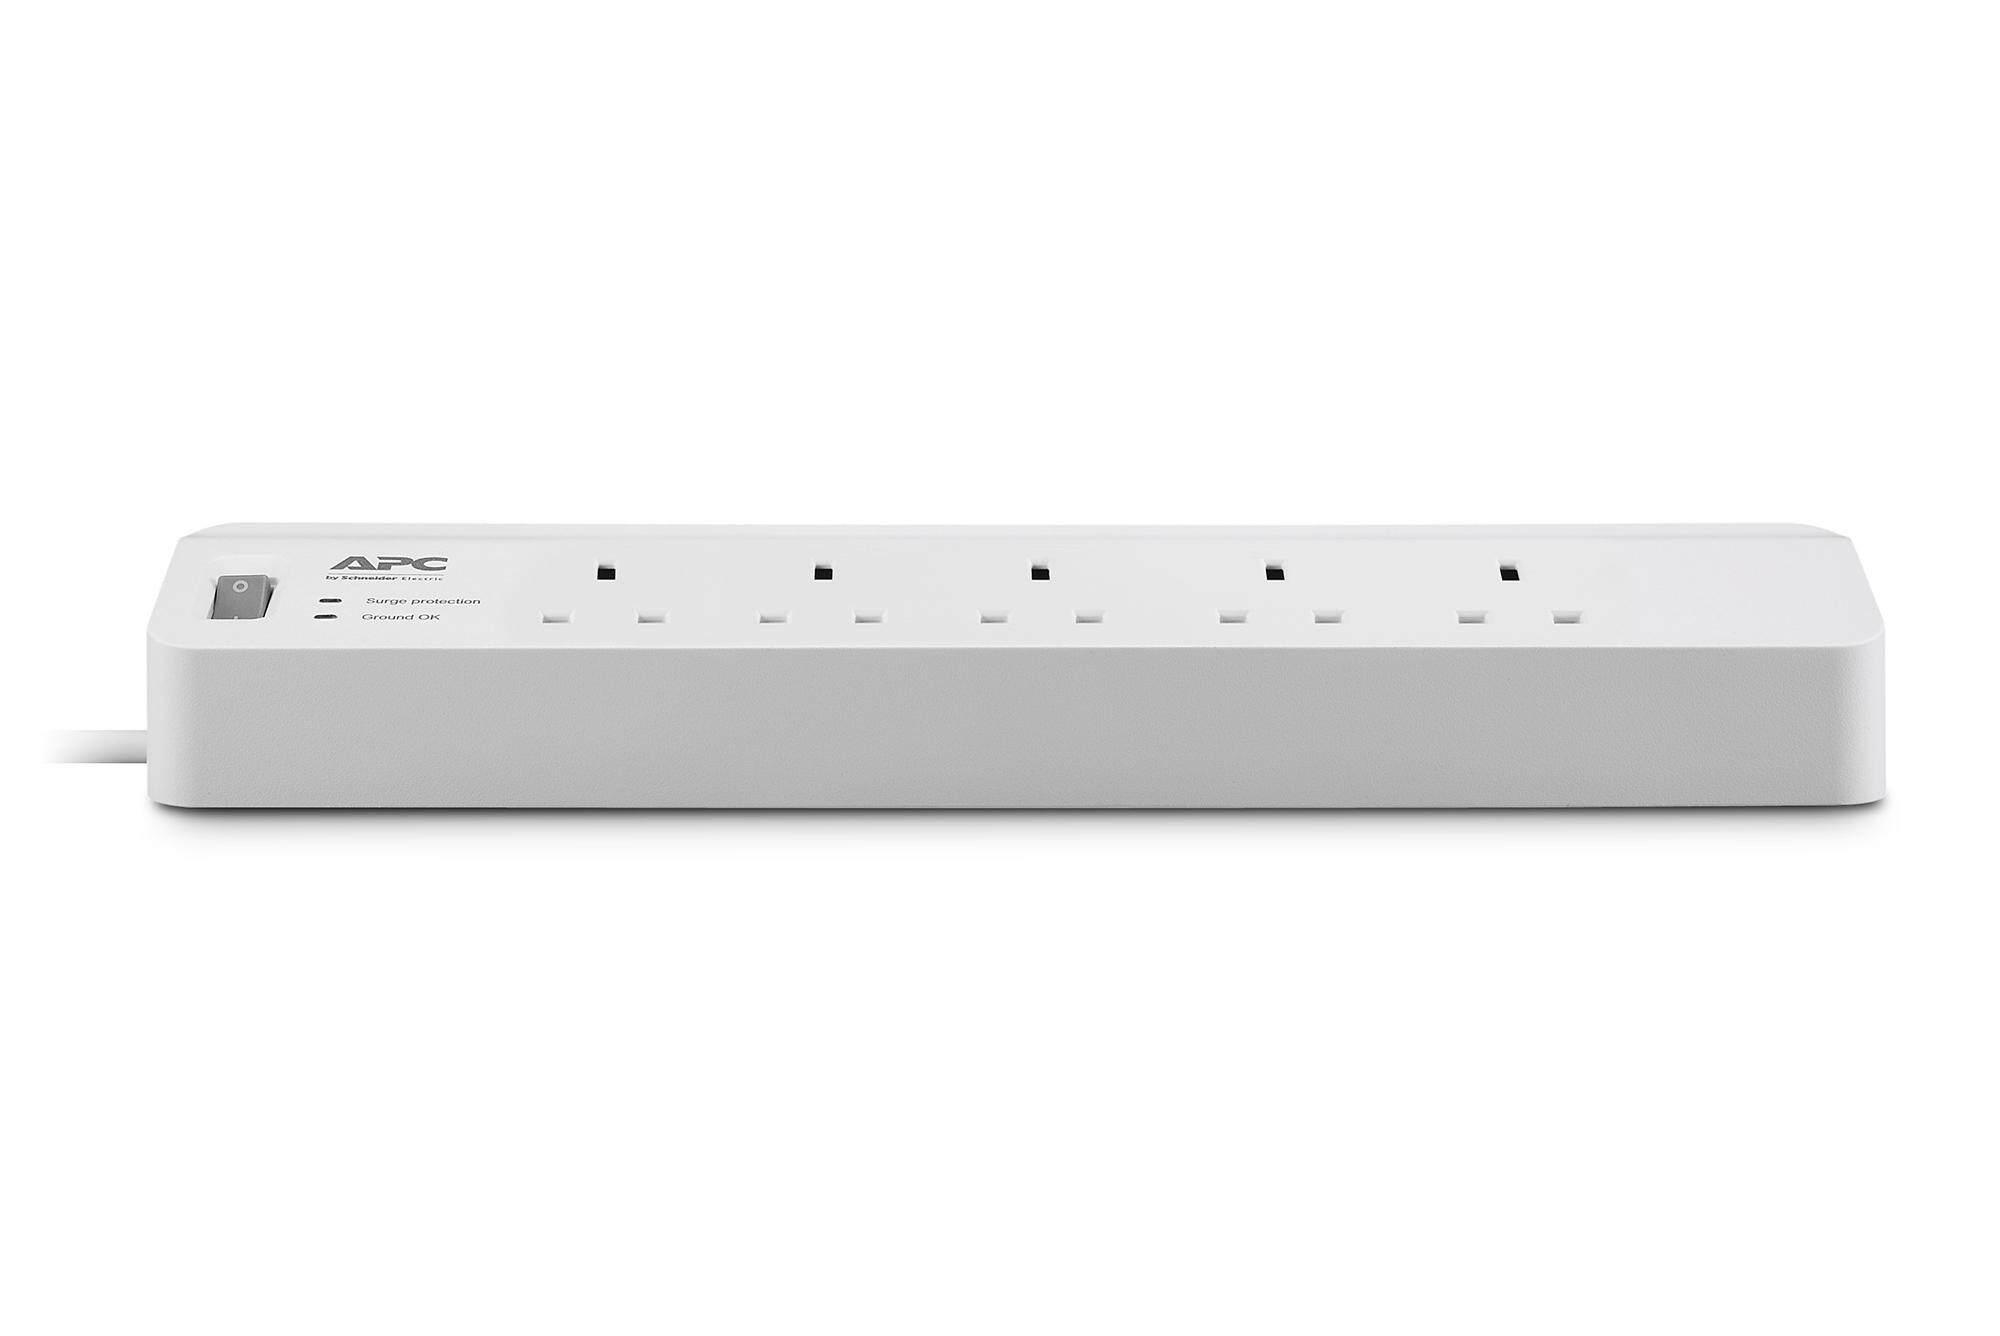 APC PM5-UK Surge Protector 5-Plugs 2M Extension Socket (Single / Twin Pack)